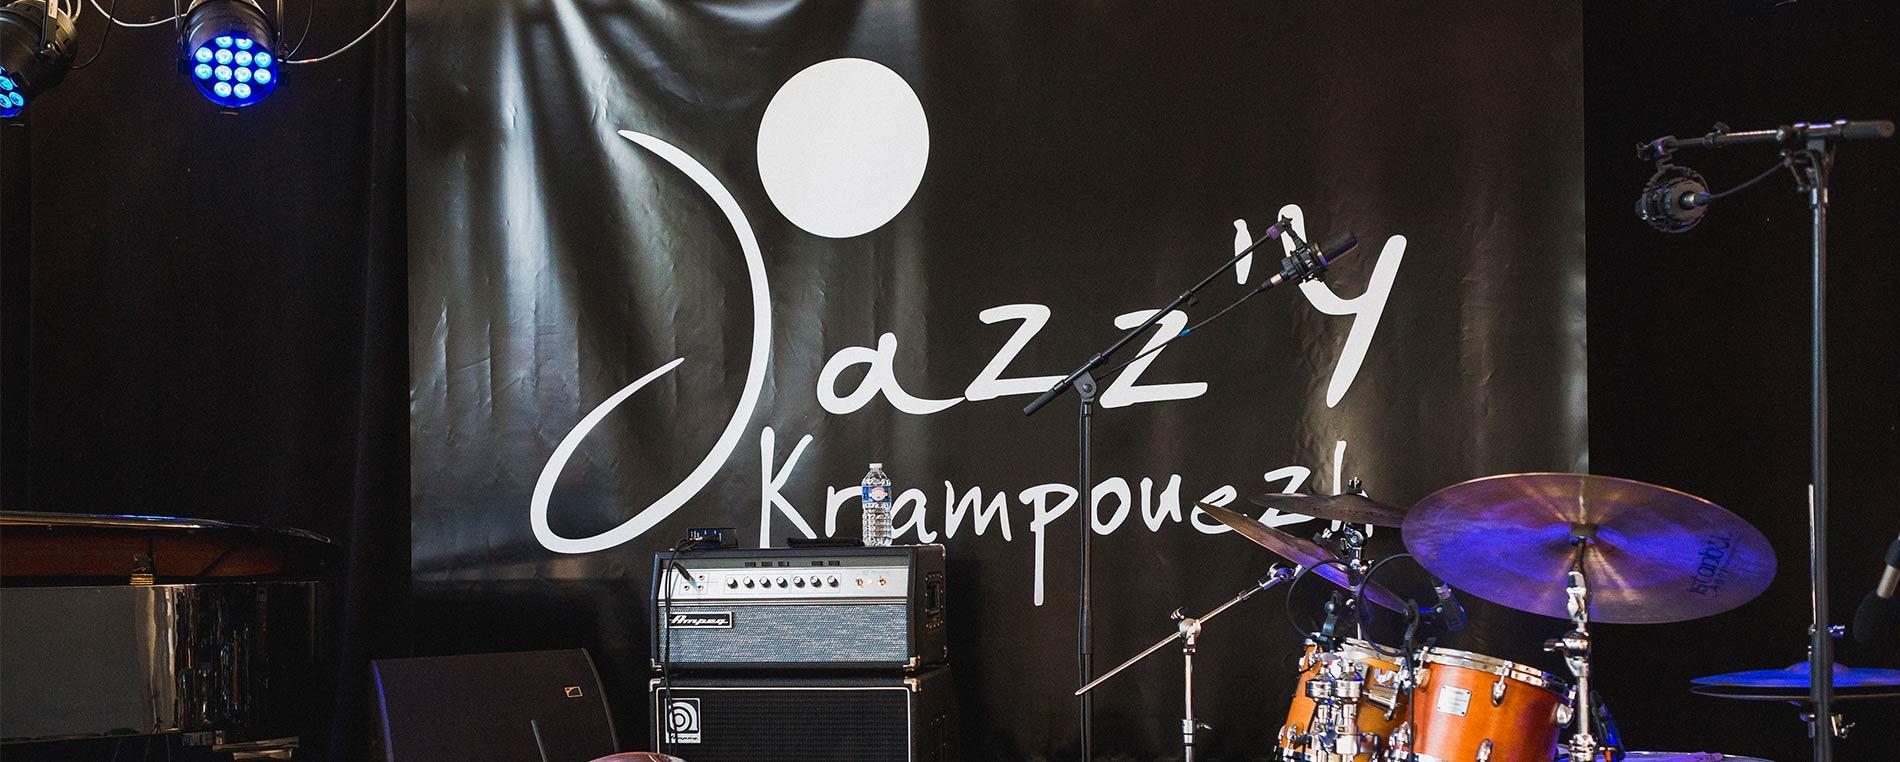 Festival Jazz'y Krampouezh